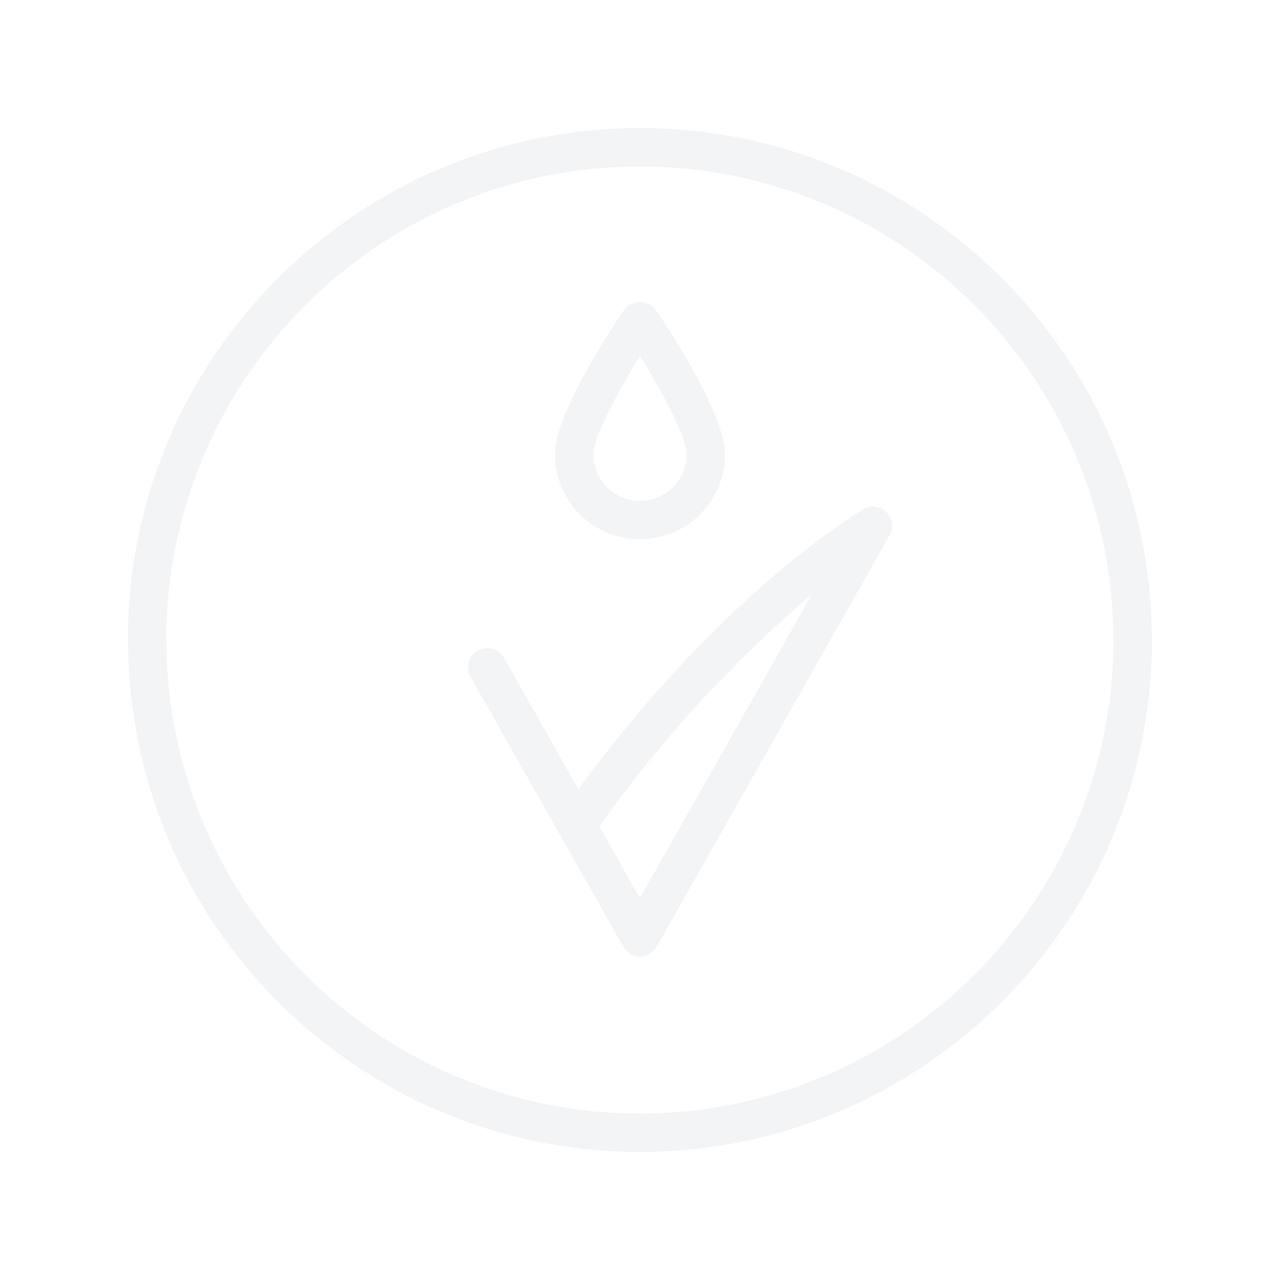 MINIGOLD Lovemark Romantic Pearl N Necklace